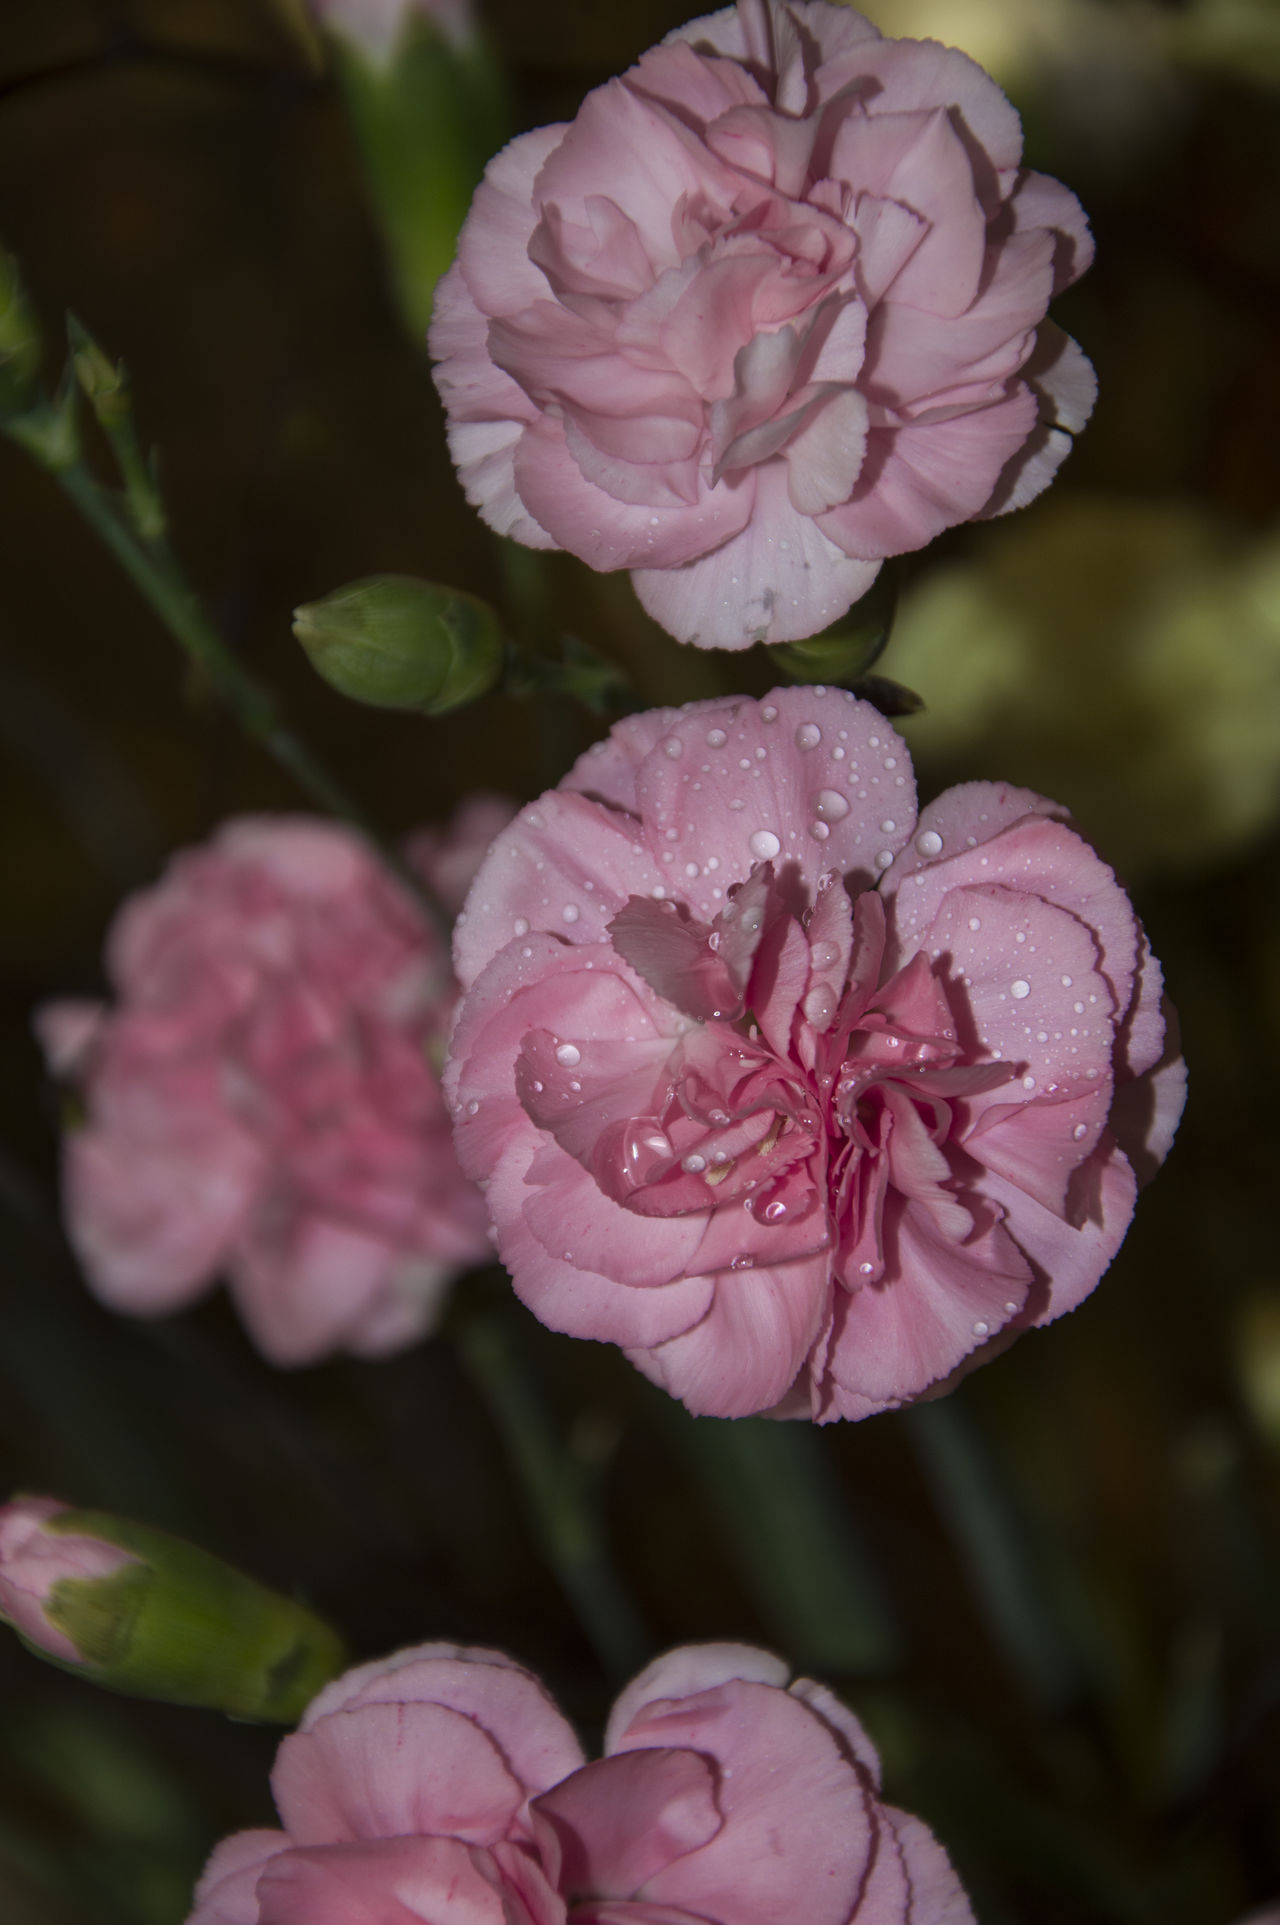 carnation Beauty In Nature Blumen Carnation Carnation Flowers Carnations Flower Nature Nelken Pink Pink Color Pink Flower Pinke Bouquet Bloom Botany Blossom Color Image Flower Head Image Focus Technique Pink Stamen Selective Focus Focus On Foreground Flowers Millennial Pink